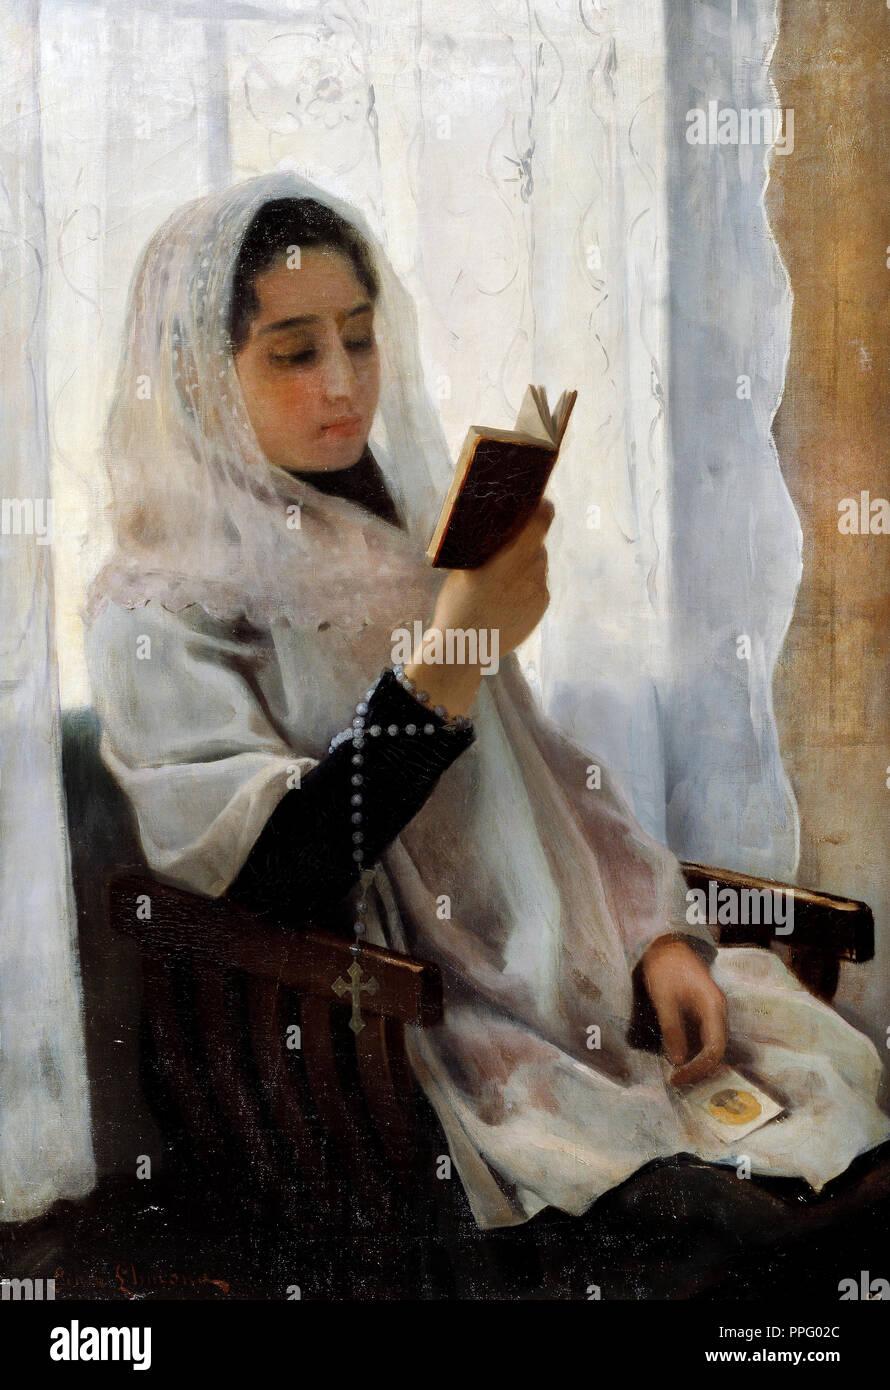 Joan Llimona - Reading 1891 Oil on canvas. Museu Nacional d'Art de Catalunya, Barcelona, Spain. - Stock Image